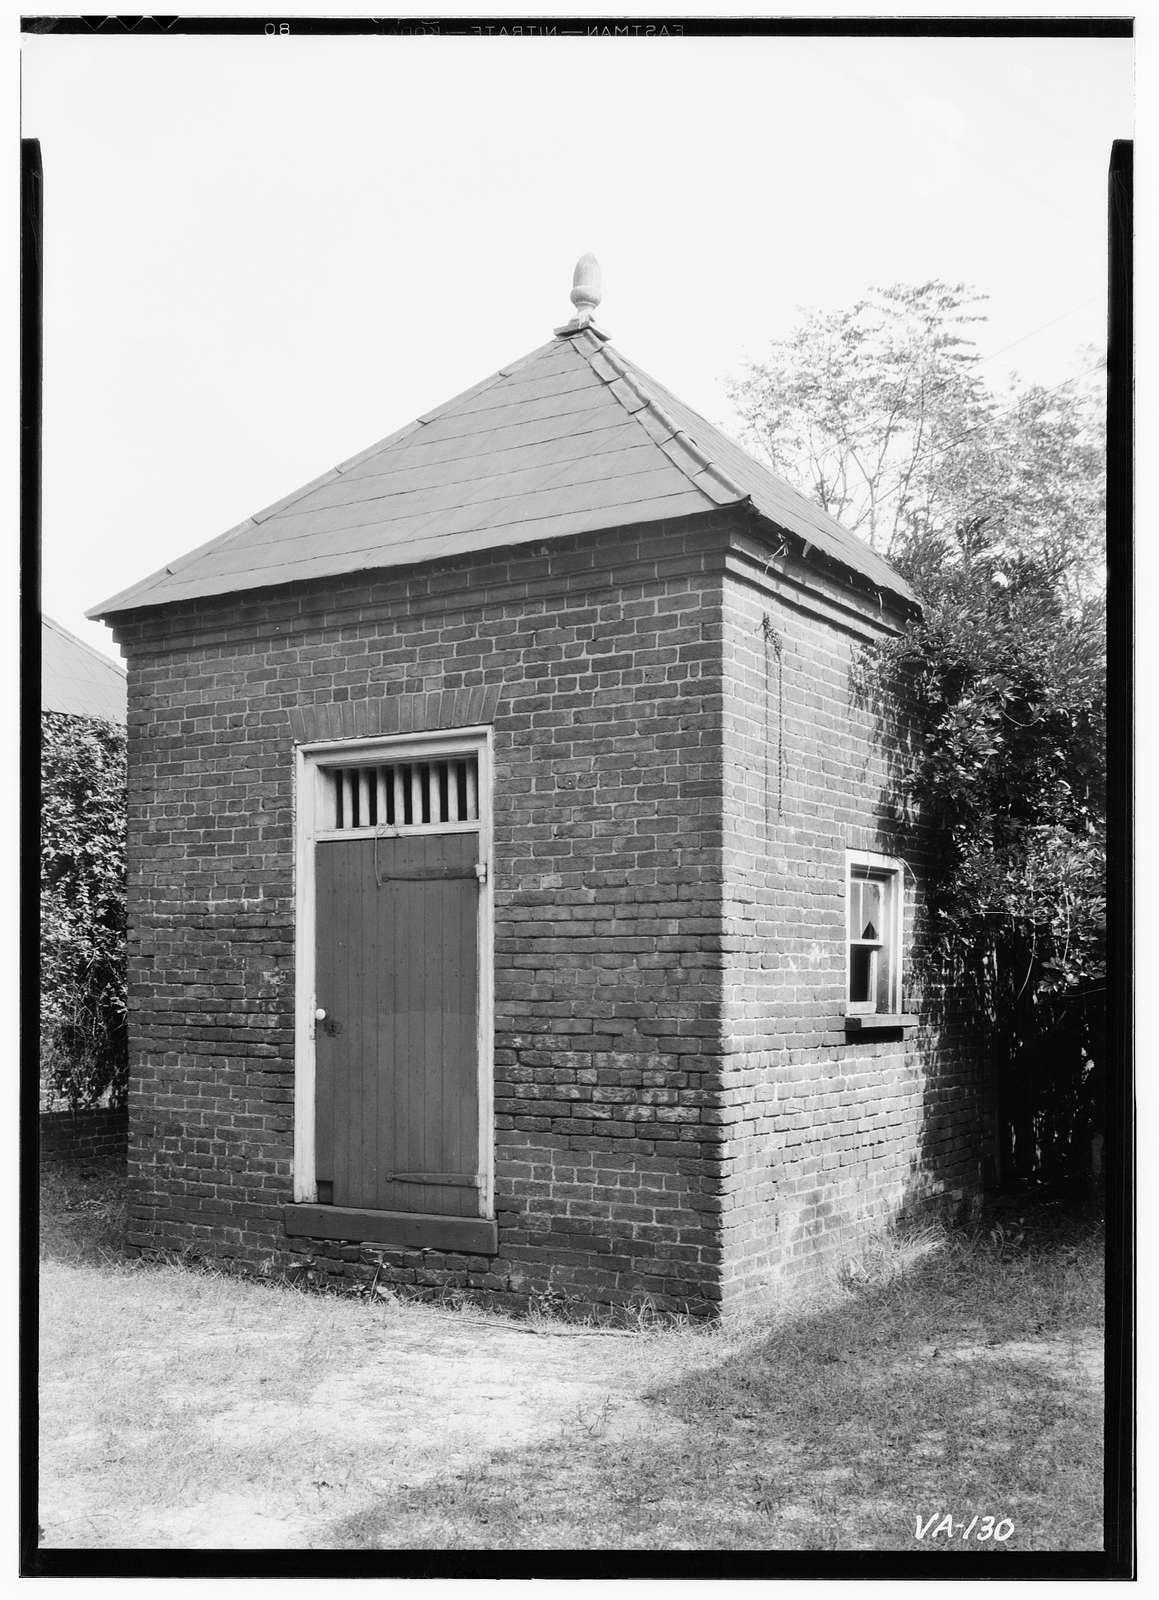 Dunn House & Outbuildings, 105 South Sycamore Street, Petersburg, Petersburg, VA